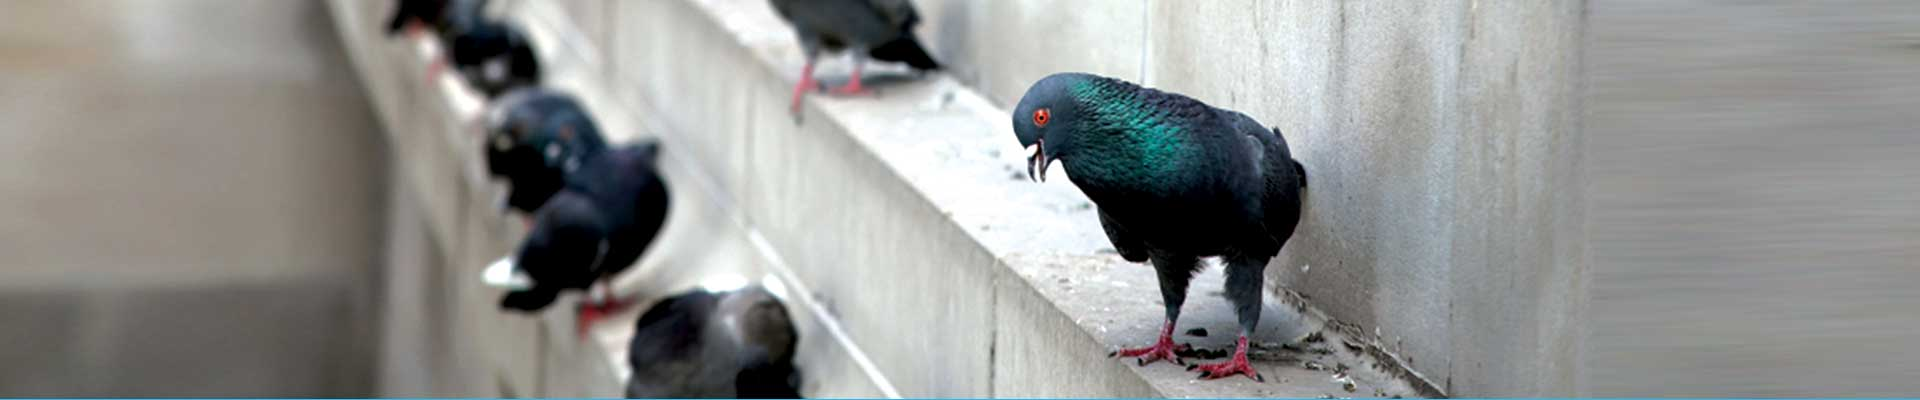 https://www.albanypestcontrol.co.uk/wp-content/uploads/2017/05/pigeon.jpg